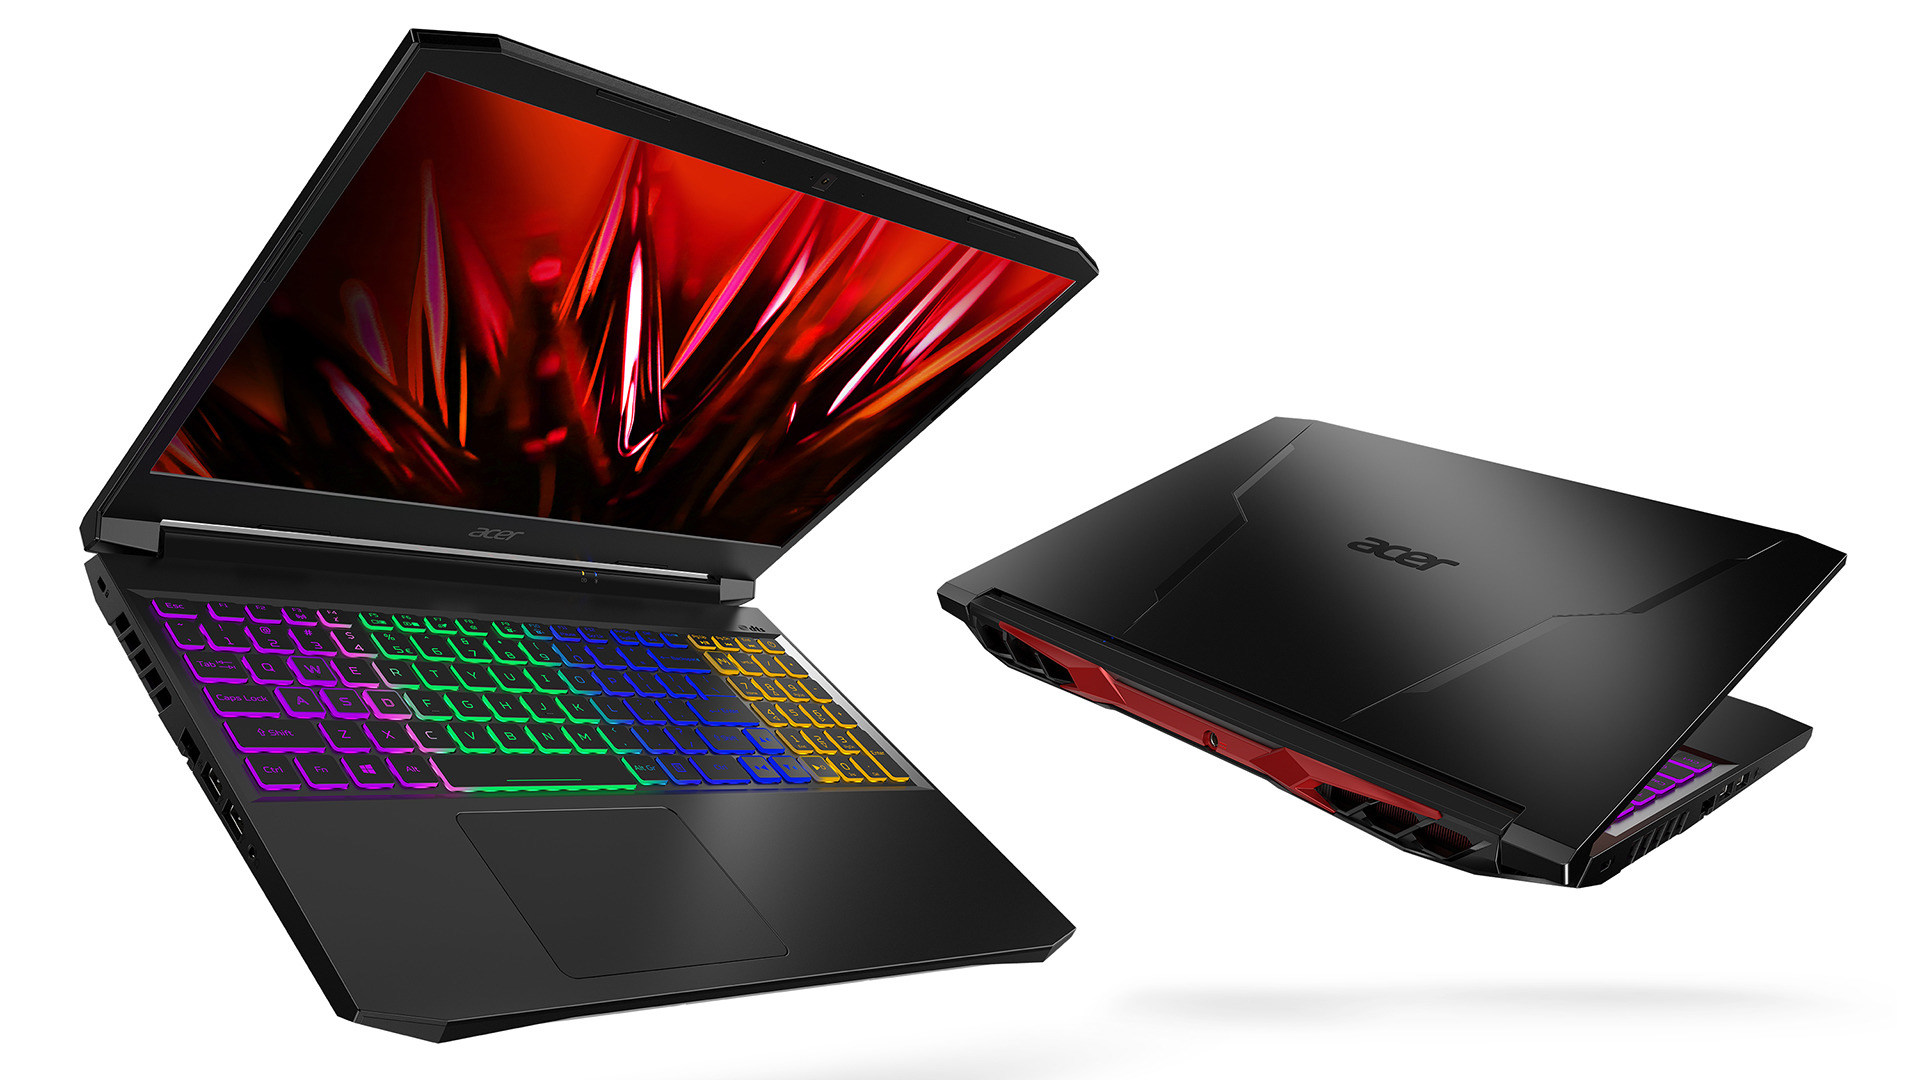 Acer Aspire / Nitro (2021)